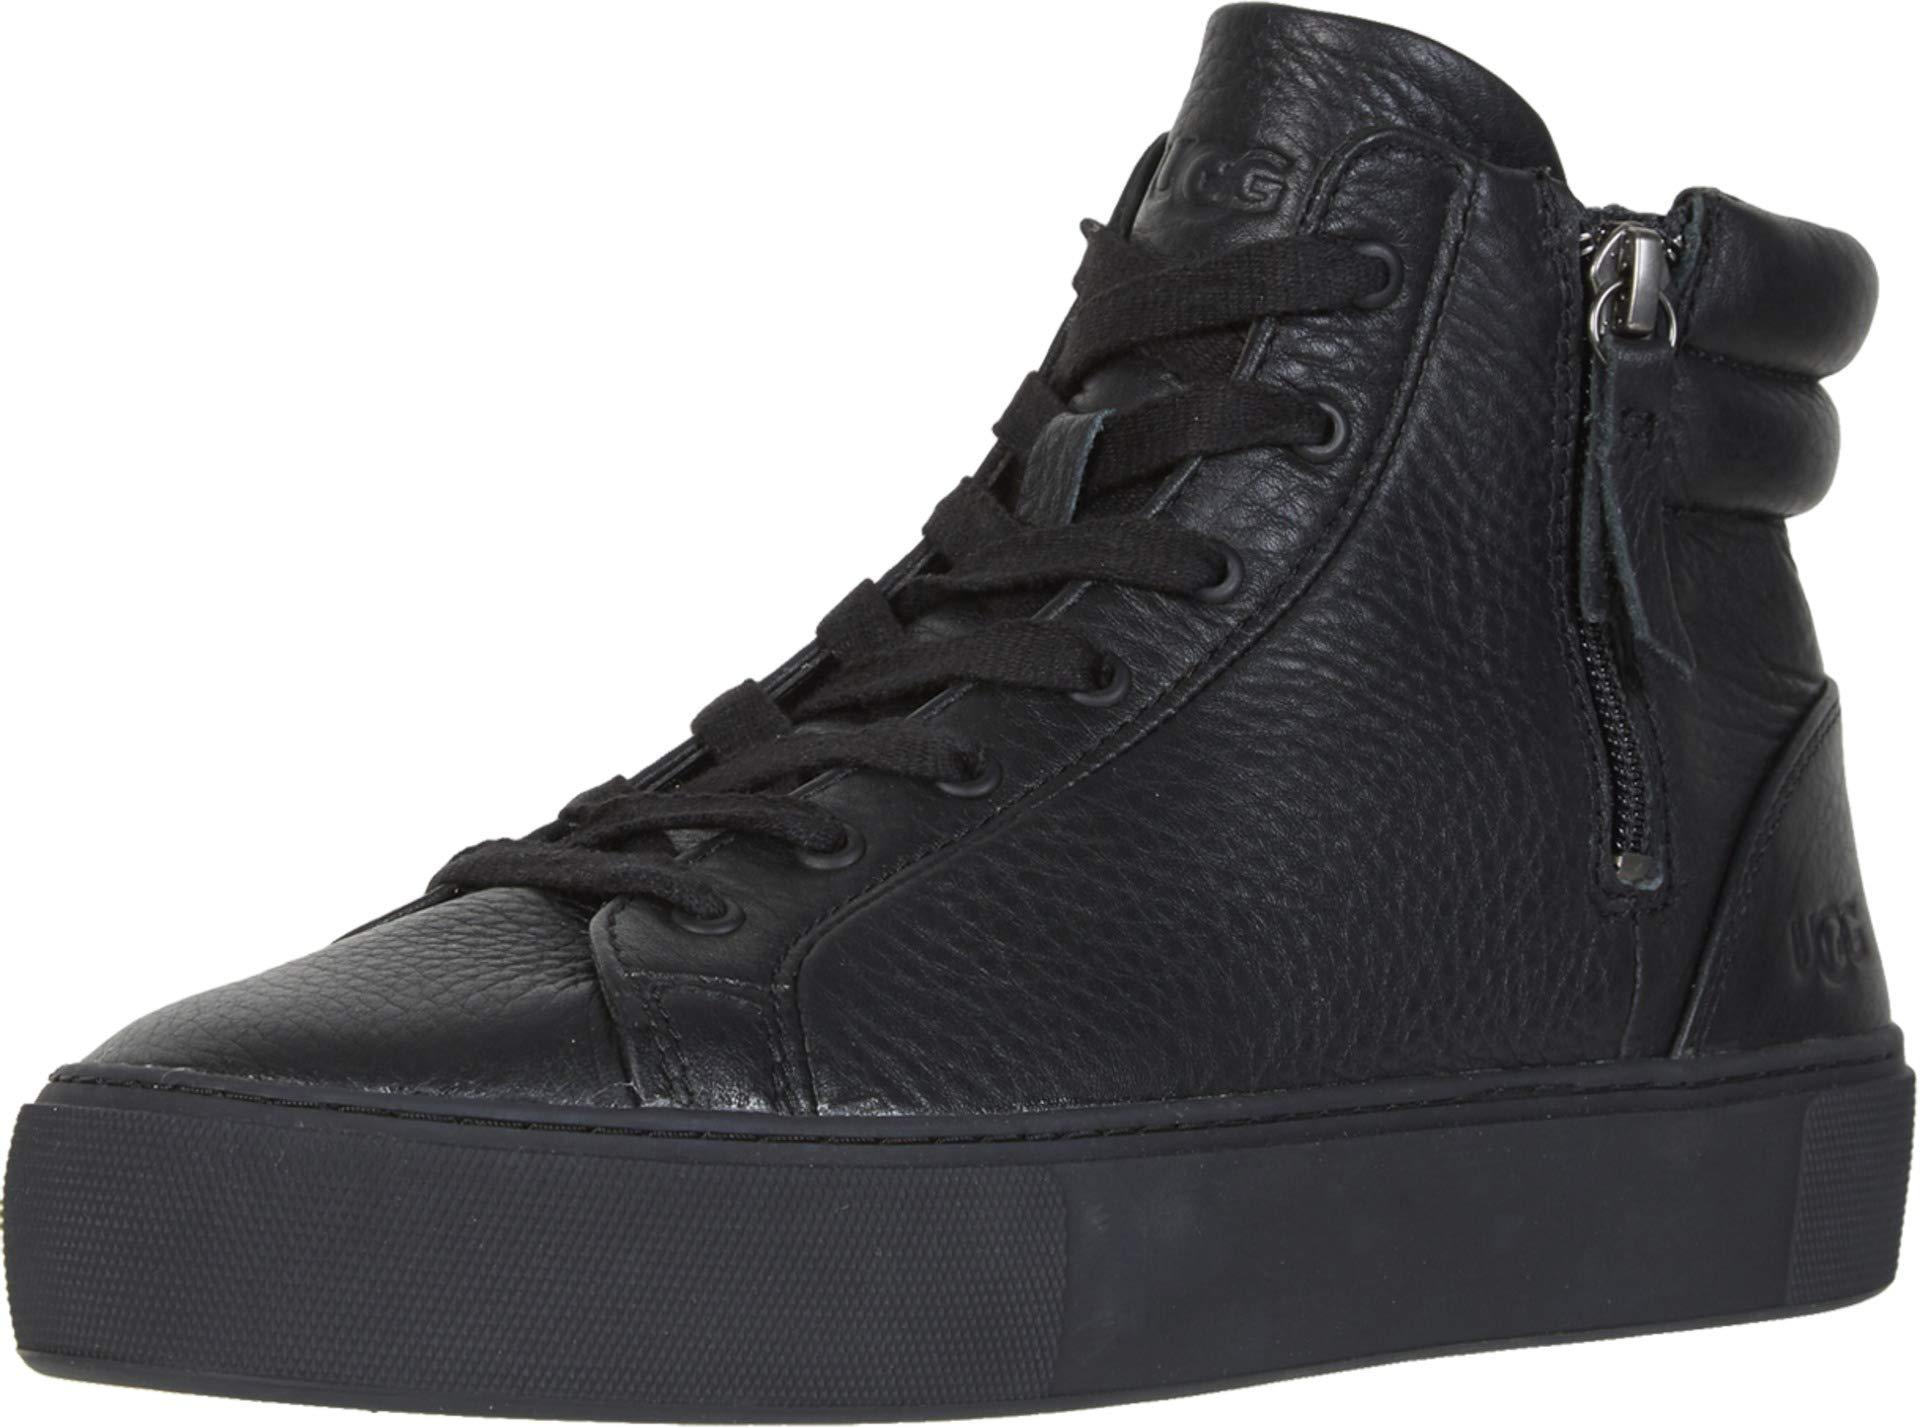 UGG Women's OLLI Sneaker, Black Leather, 7.5 M US